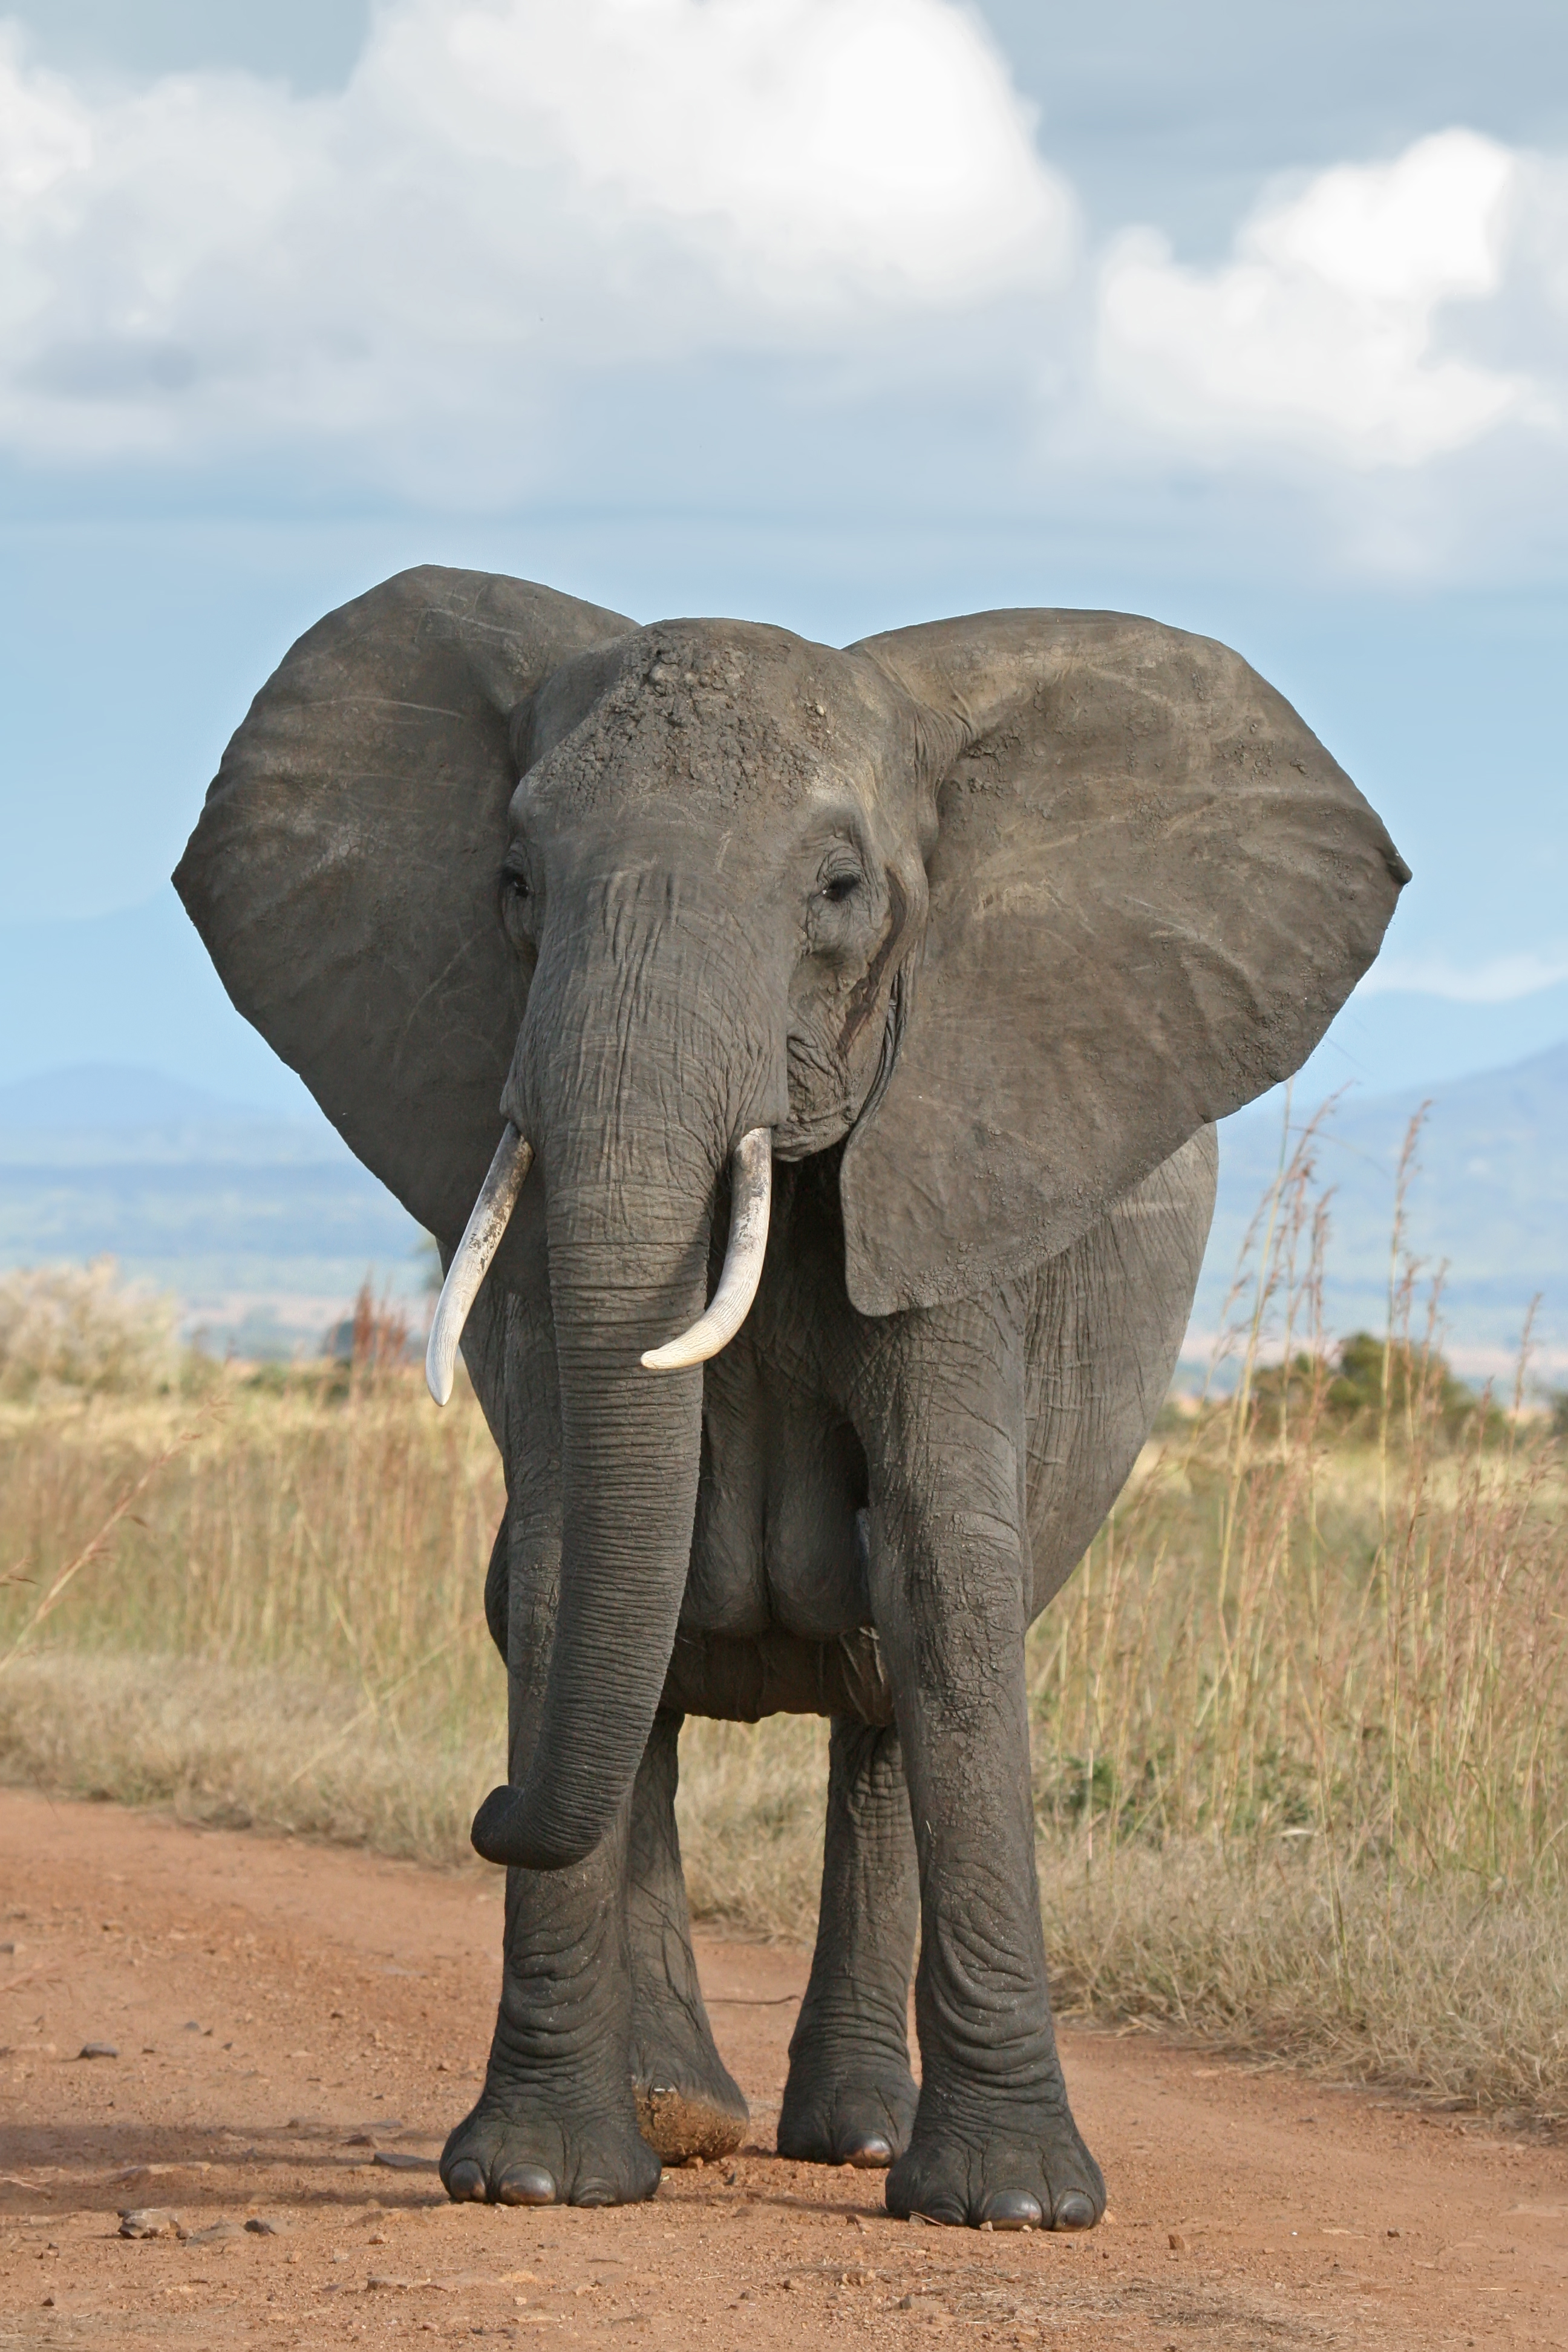 High Resolution Wallpaper | Elephant 2592x3888 px